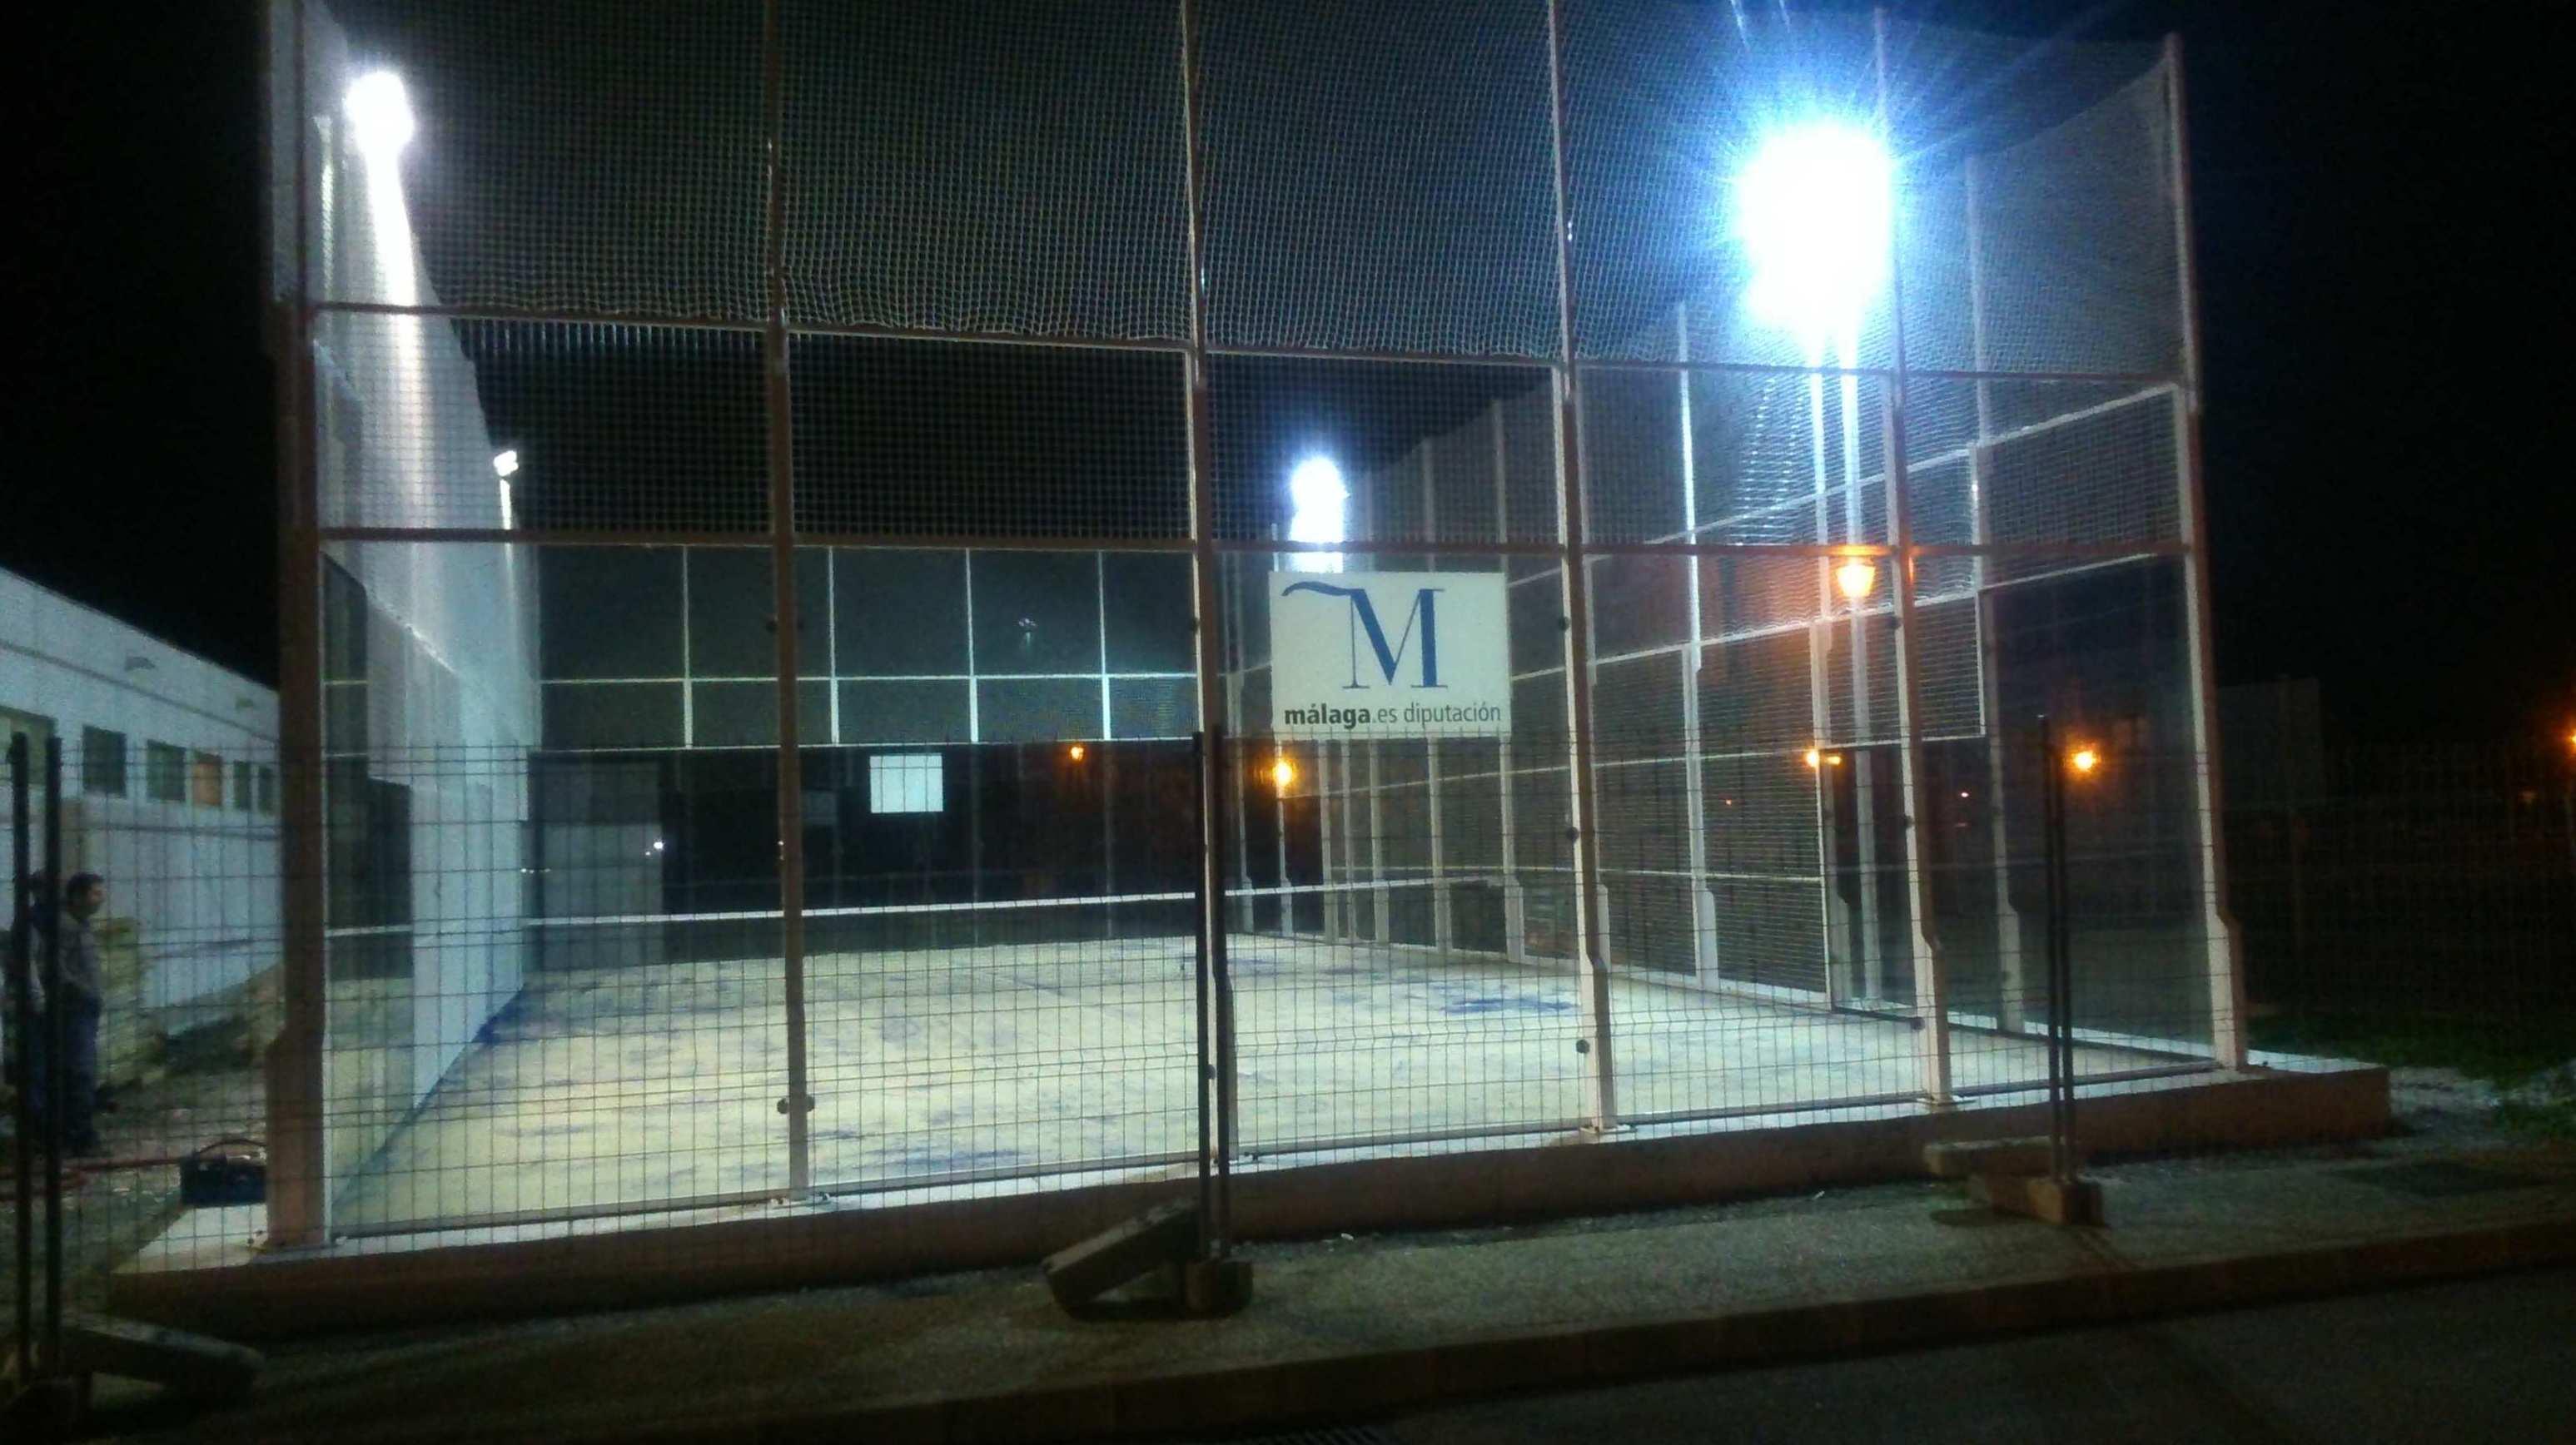 Iluminación de espacios deportivos en Málaga